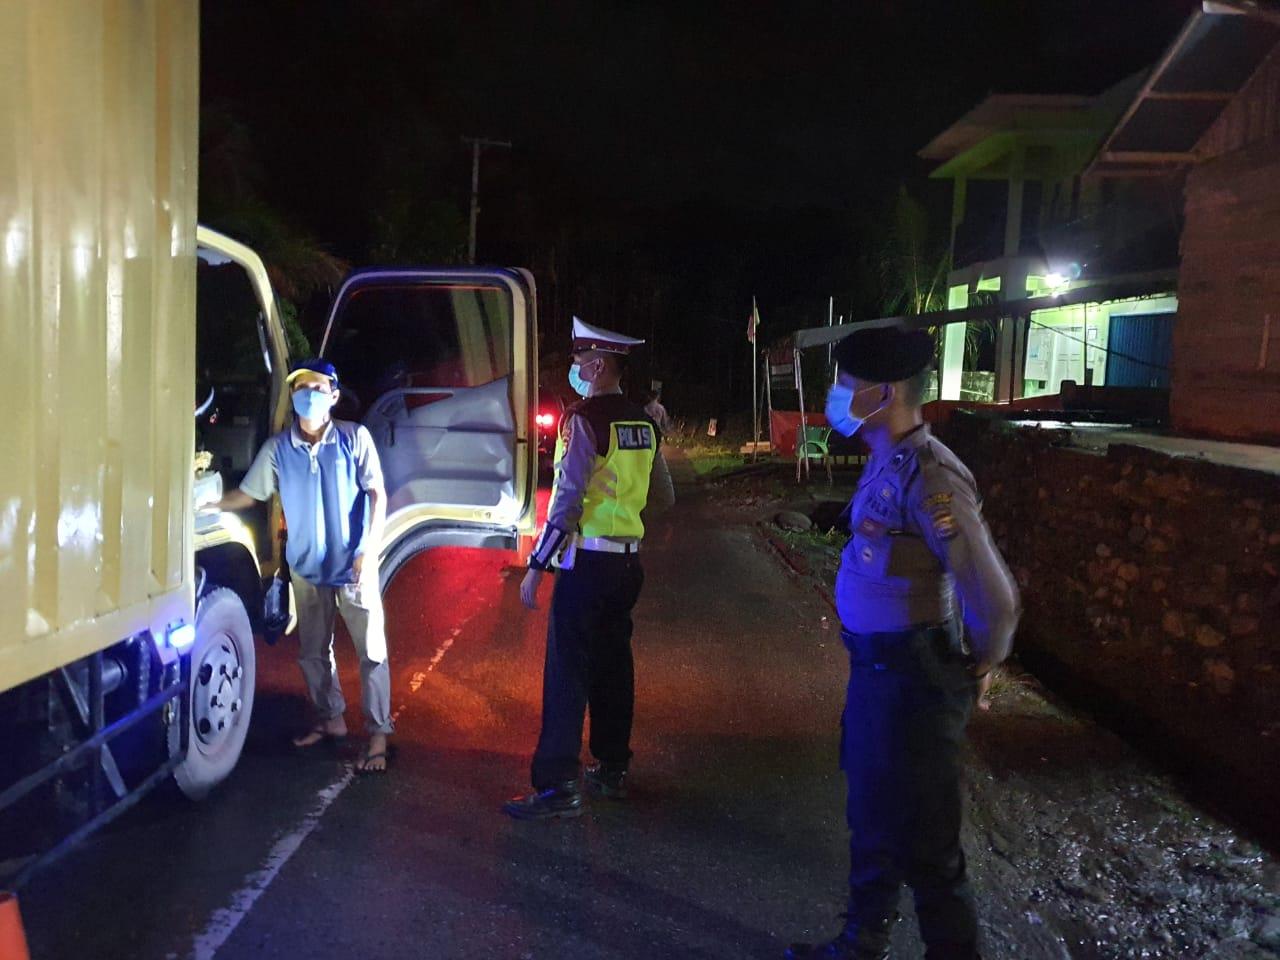 Personil Gabungan Pospam Perbatasan Sumsel-Bengkulu di Desa Air Tenam Periksa Setiap Kendaraan Masuk